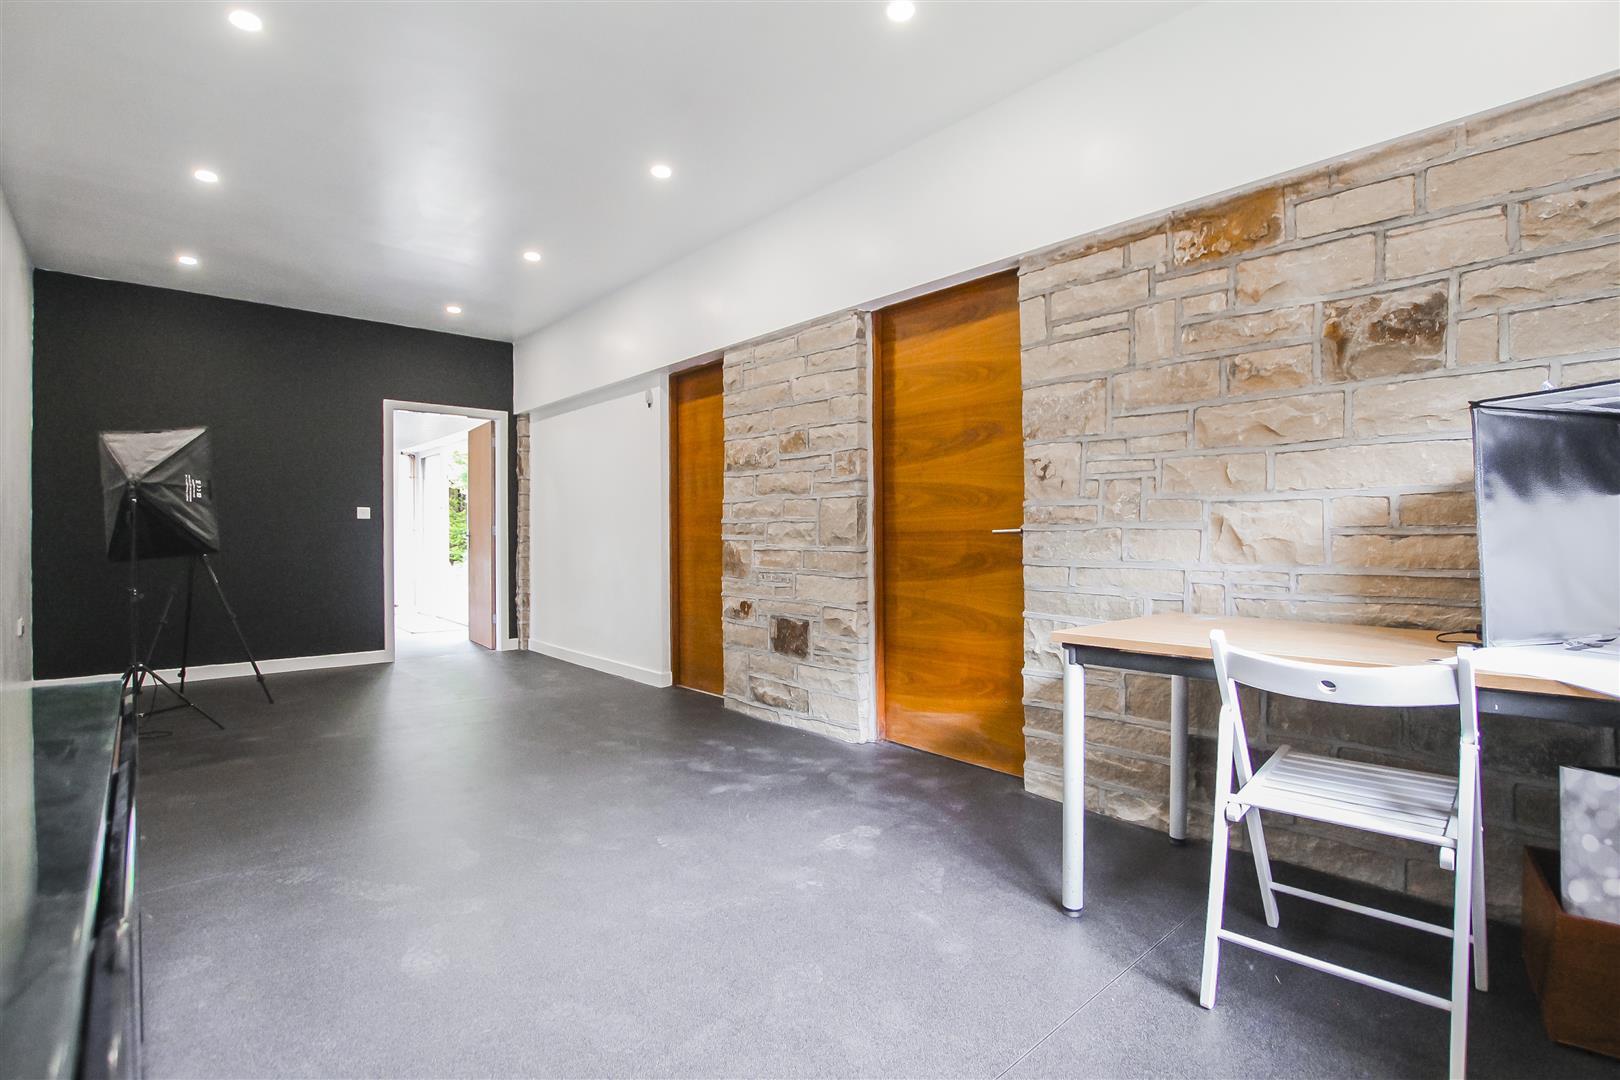 6 Bedroom Detached House For Sale - Studio